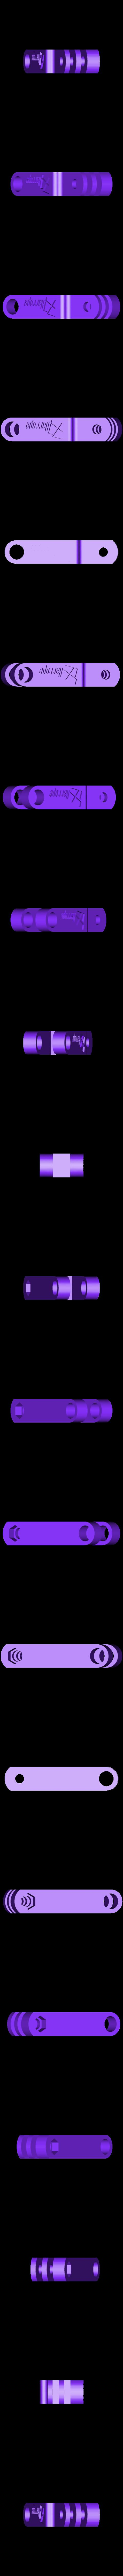 TiltGoPro.stl Download free STL file Tilt free GoPro • 3D printing model, GuillermoMaroto